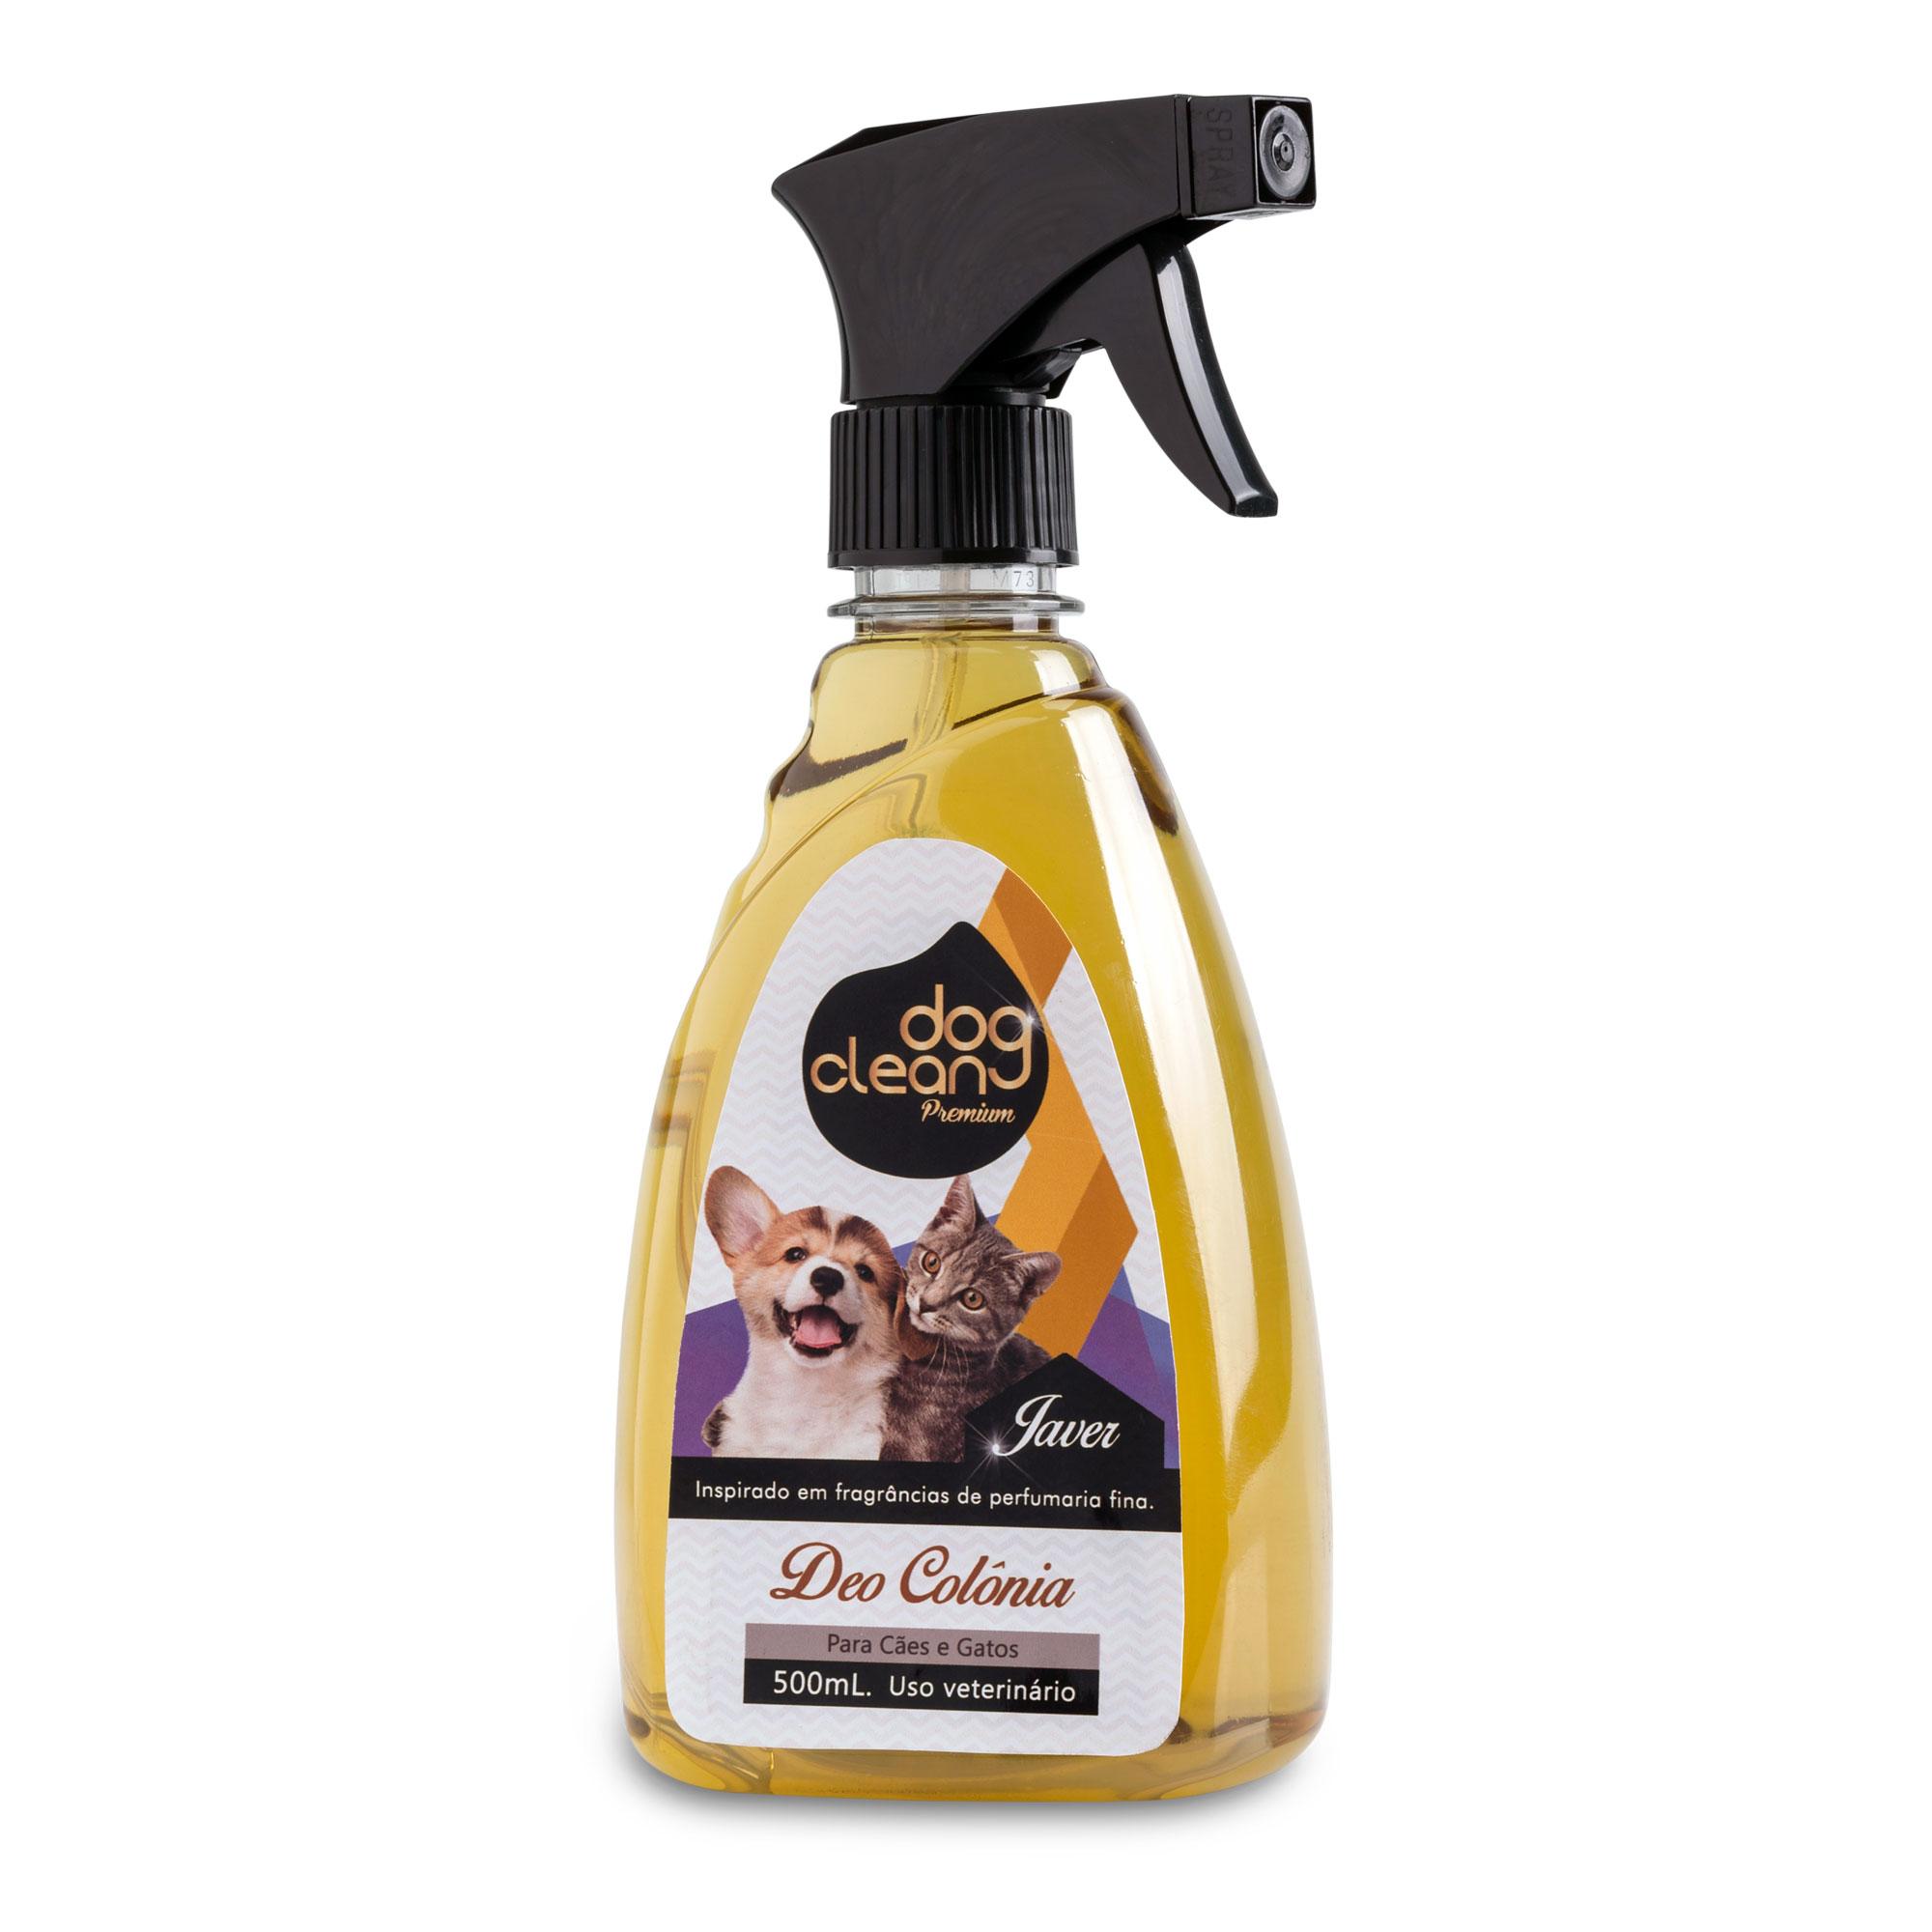 Perfume Deo Colônia Javer 500ml Dog Clean